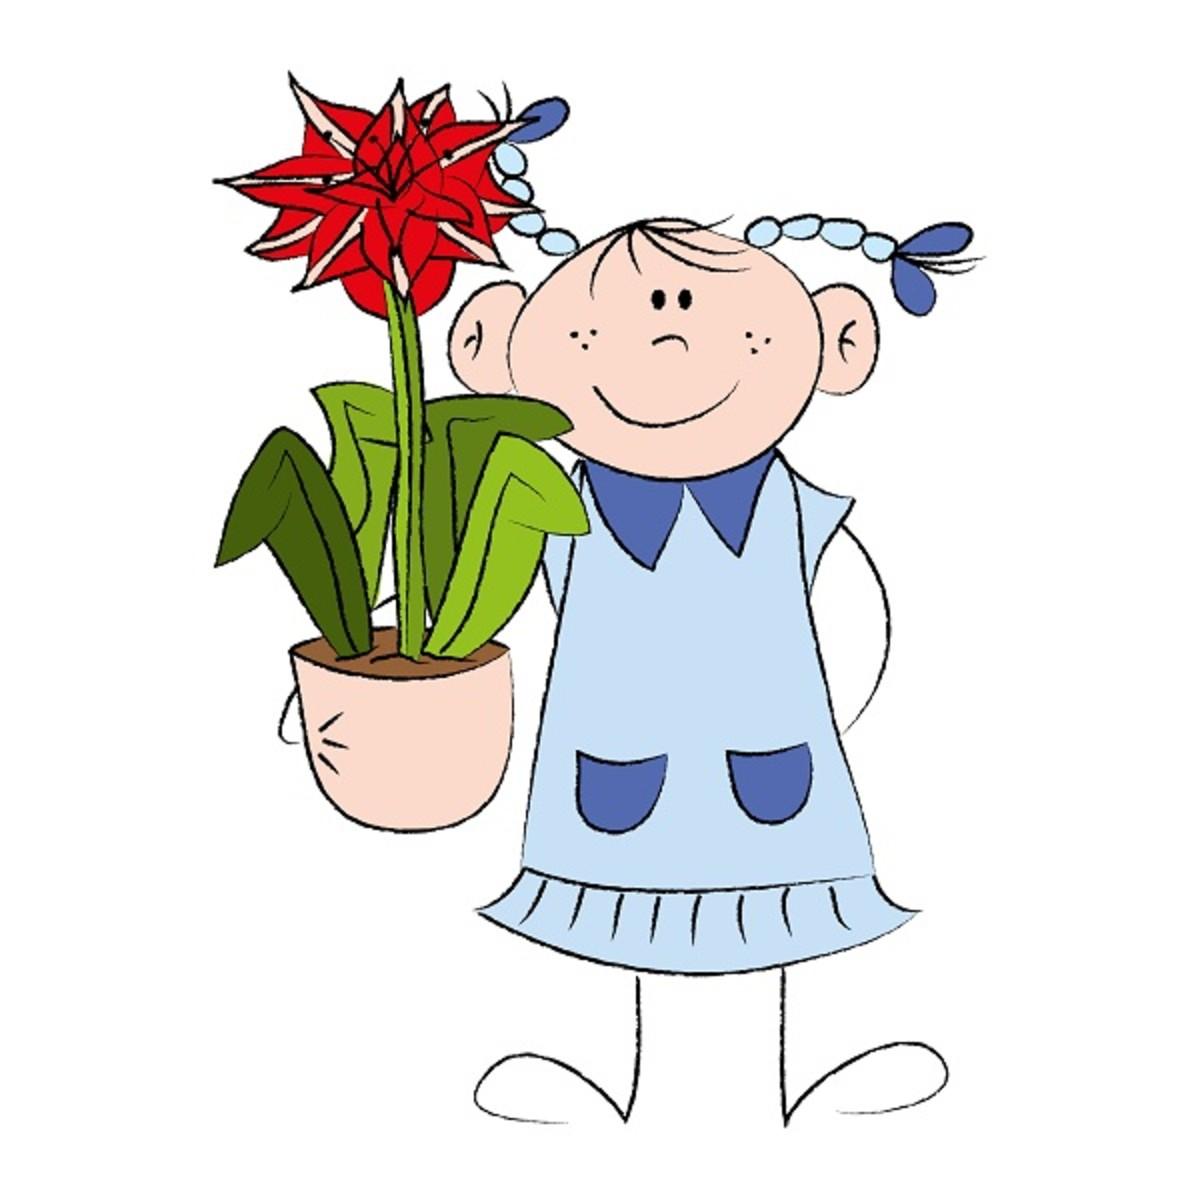 Girl with Flowering Amaryllis Bulb